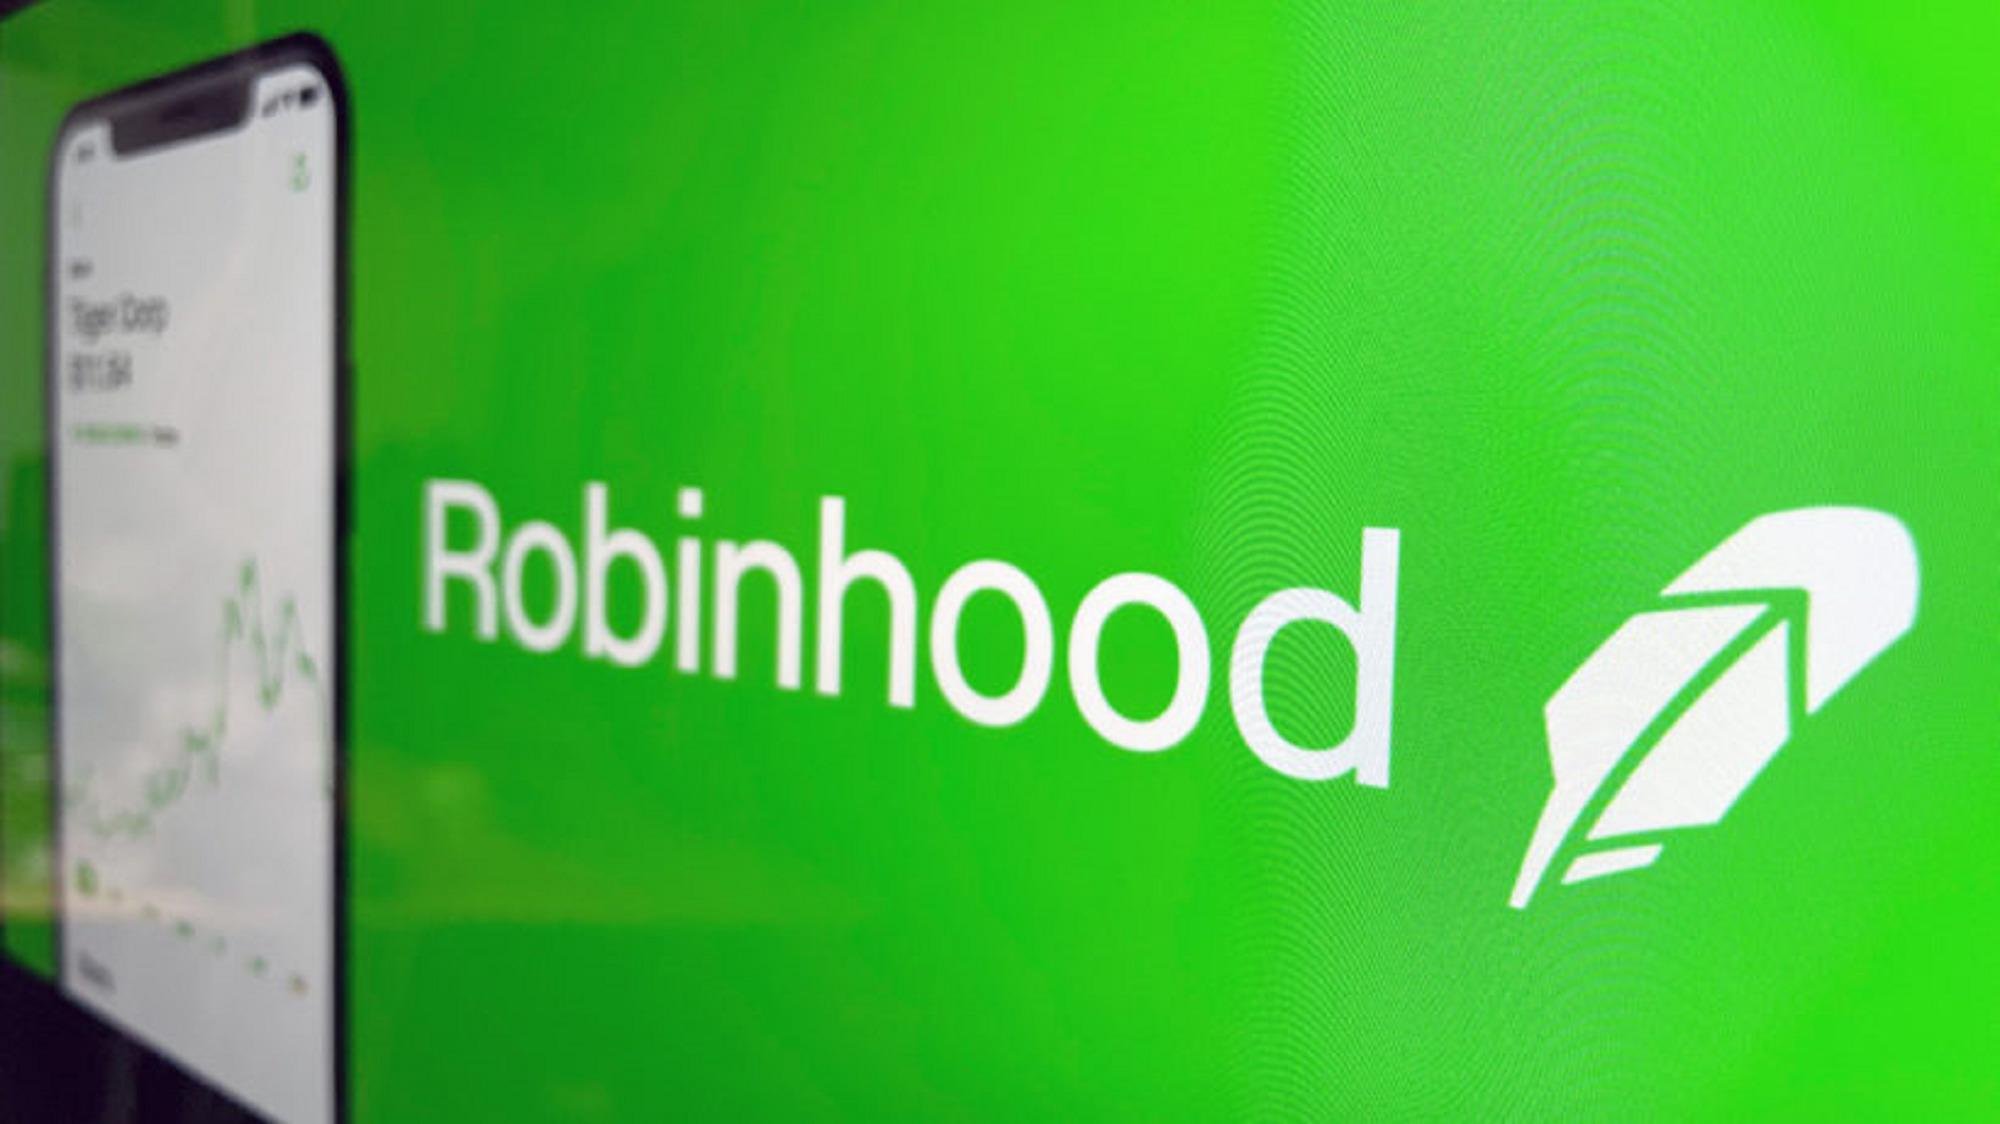 online trading academy orlando wenn robinhood optionen handel -bitcoin